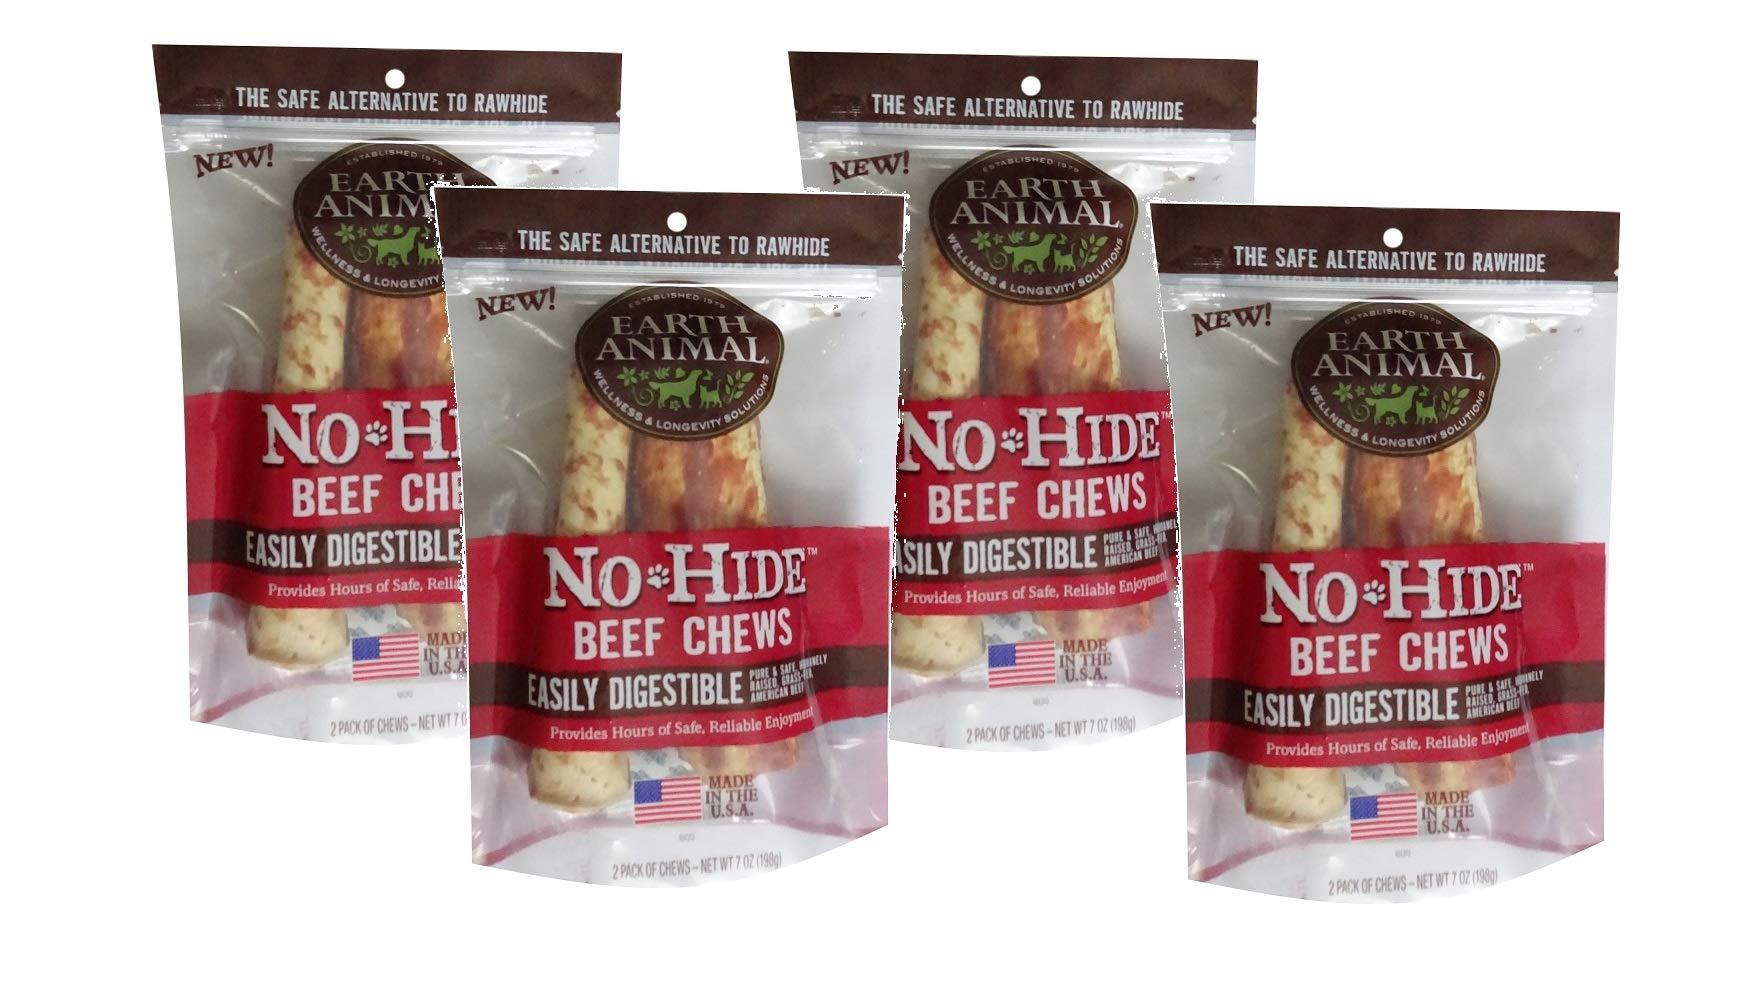 Earth Animal No-Hide Beef Chews, 7'' Each (4 Pack)